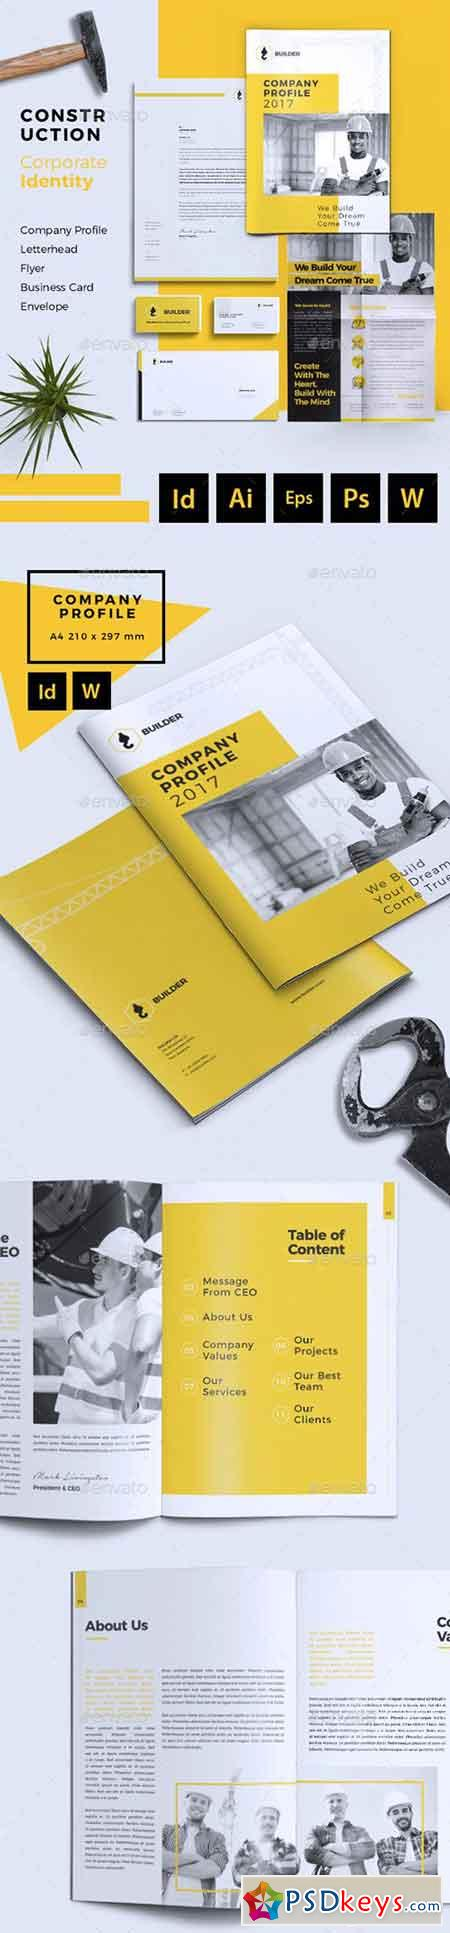 Builder Construction Corporate Branding Identity 20916904 » Free